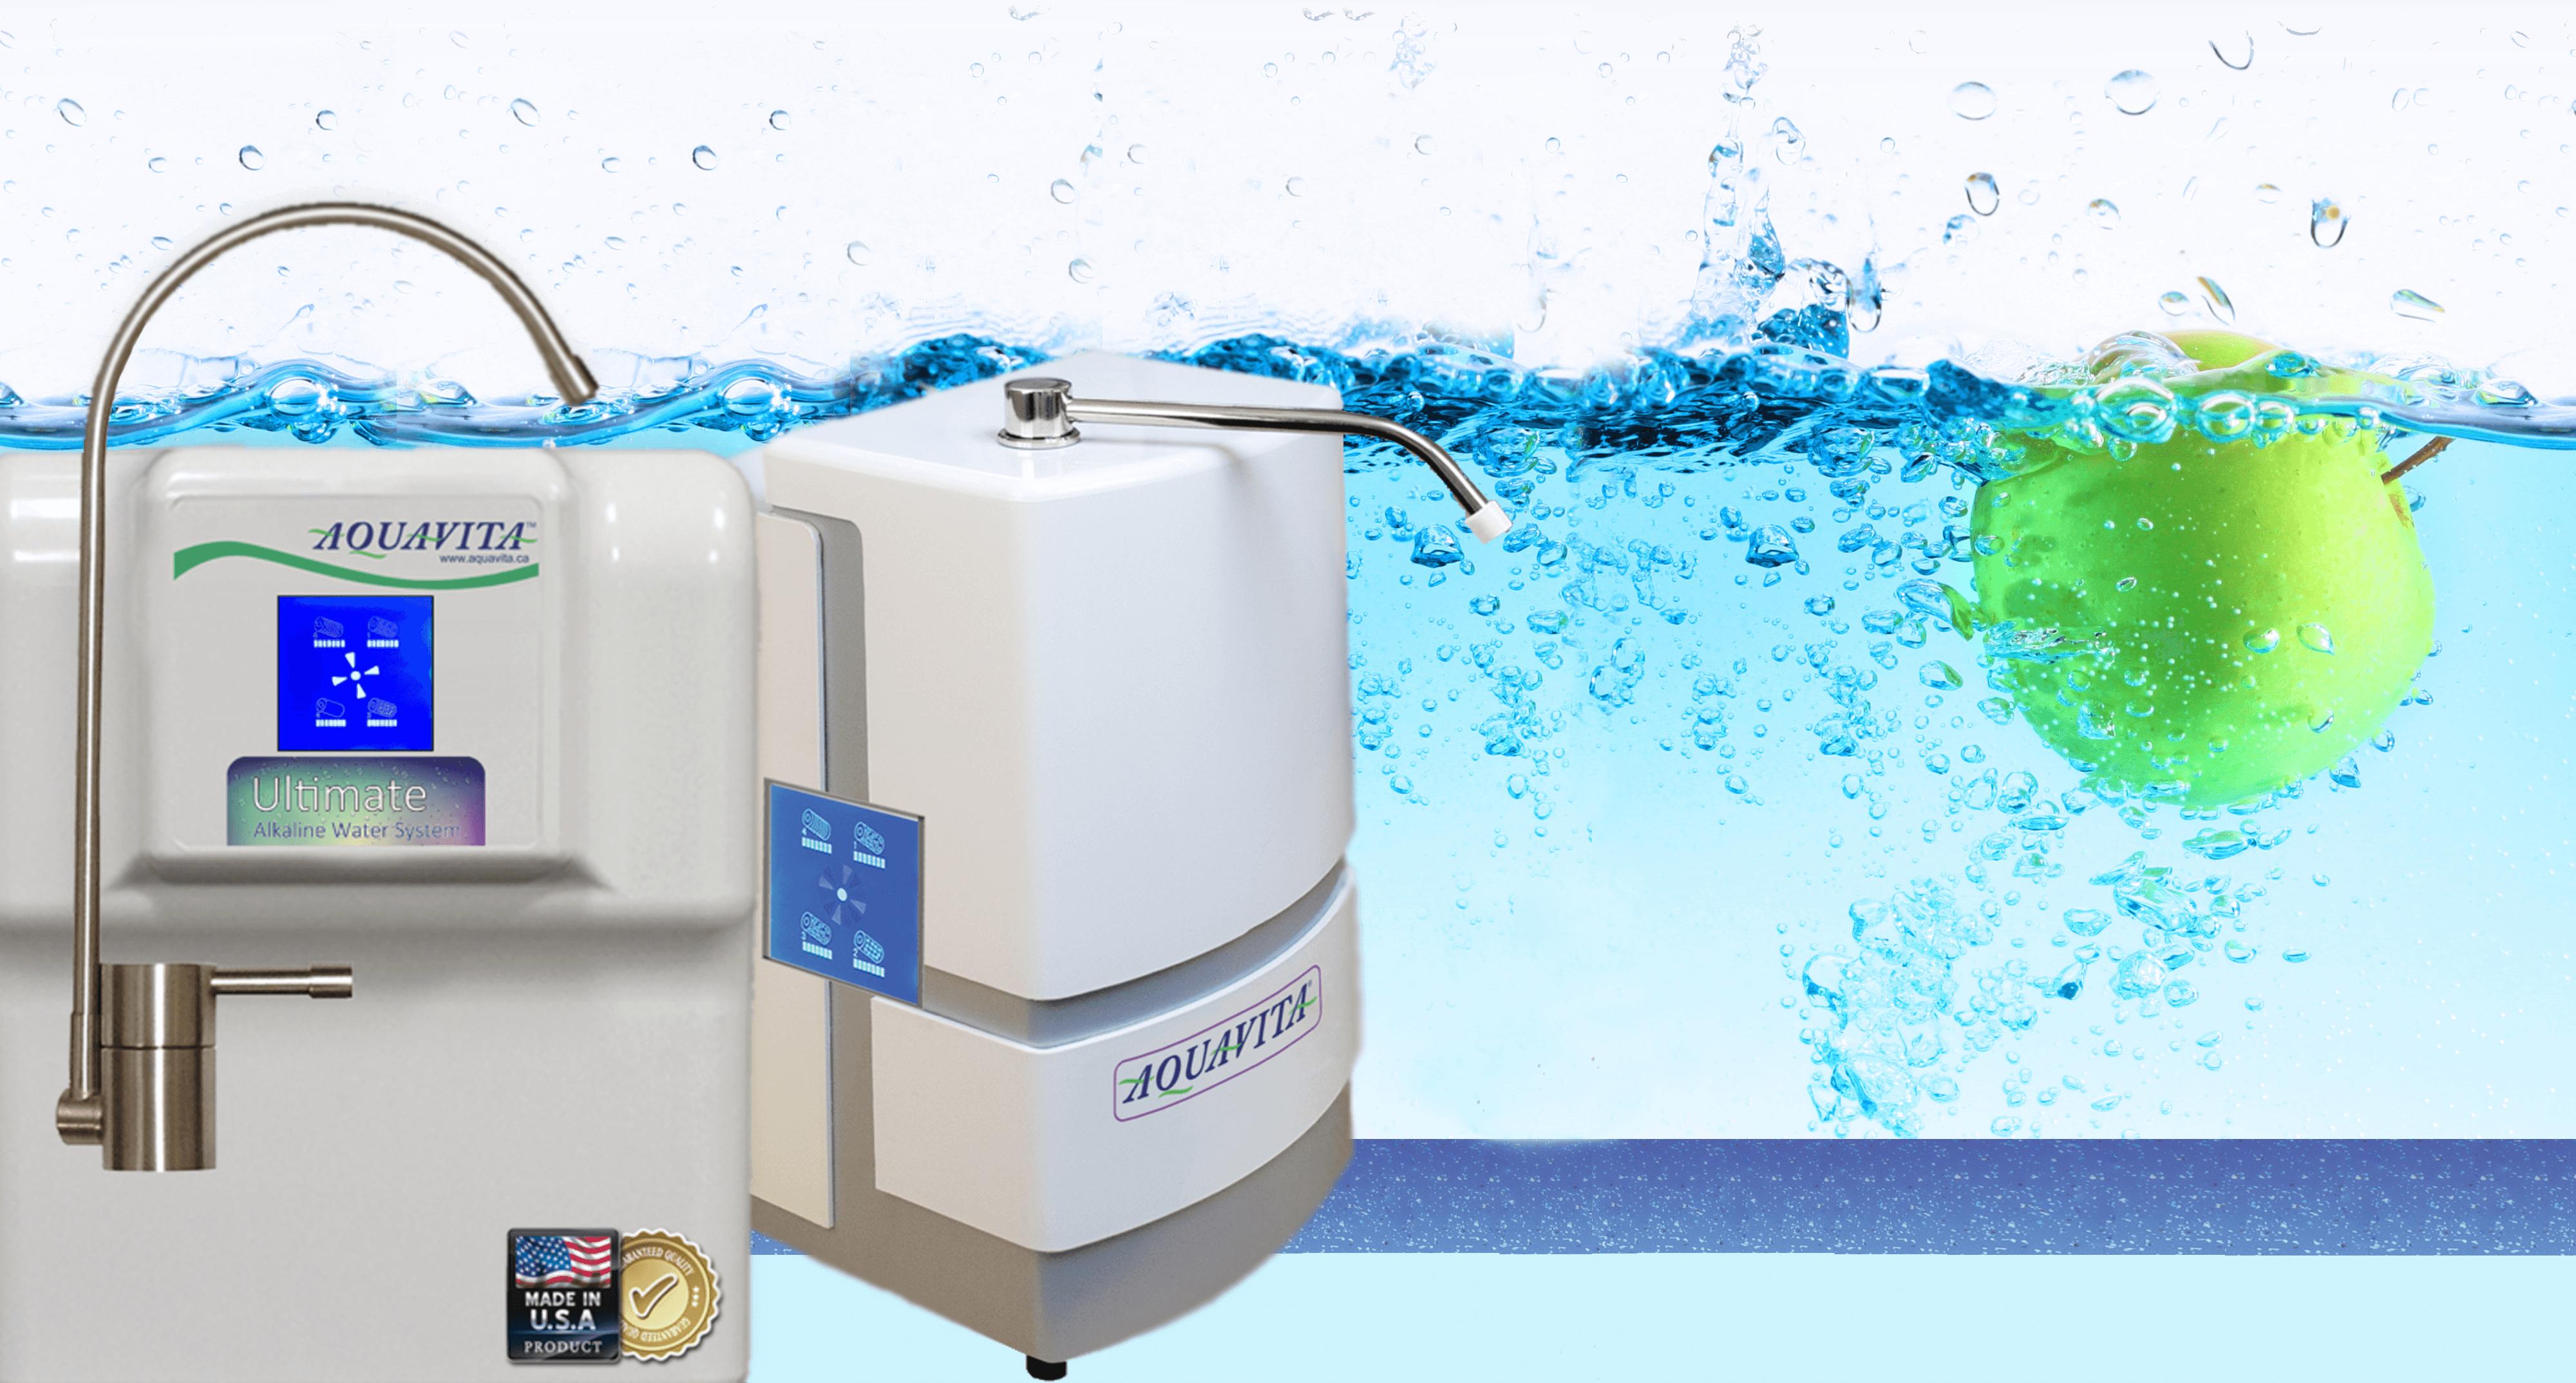 Aquavita water